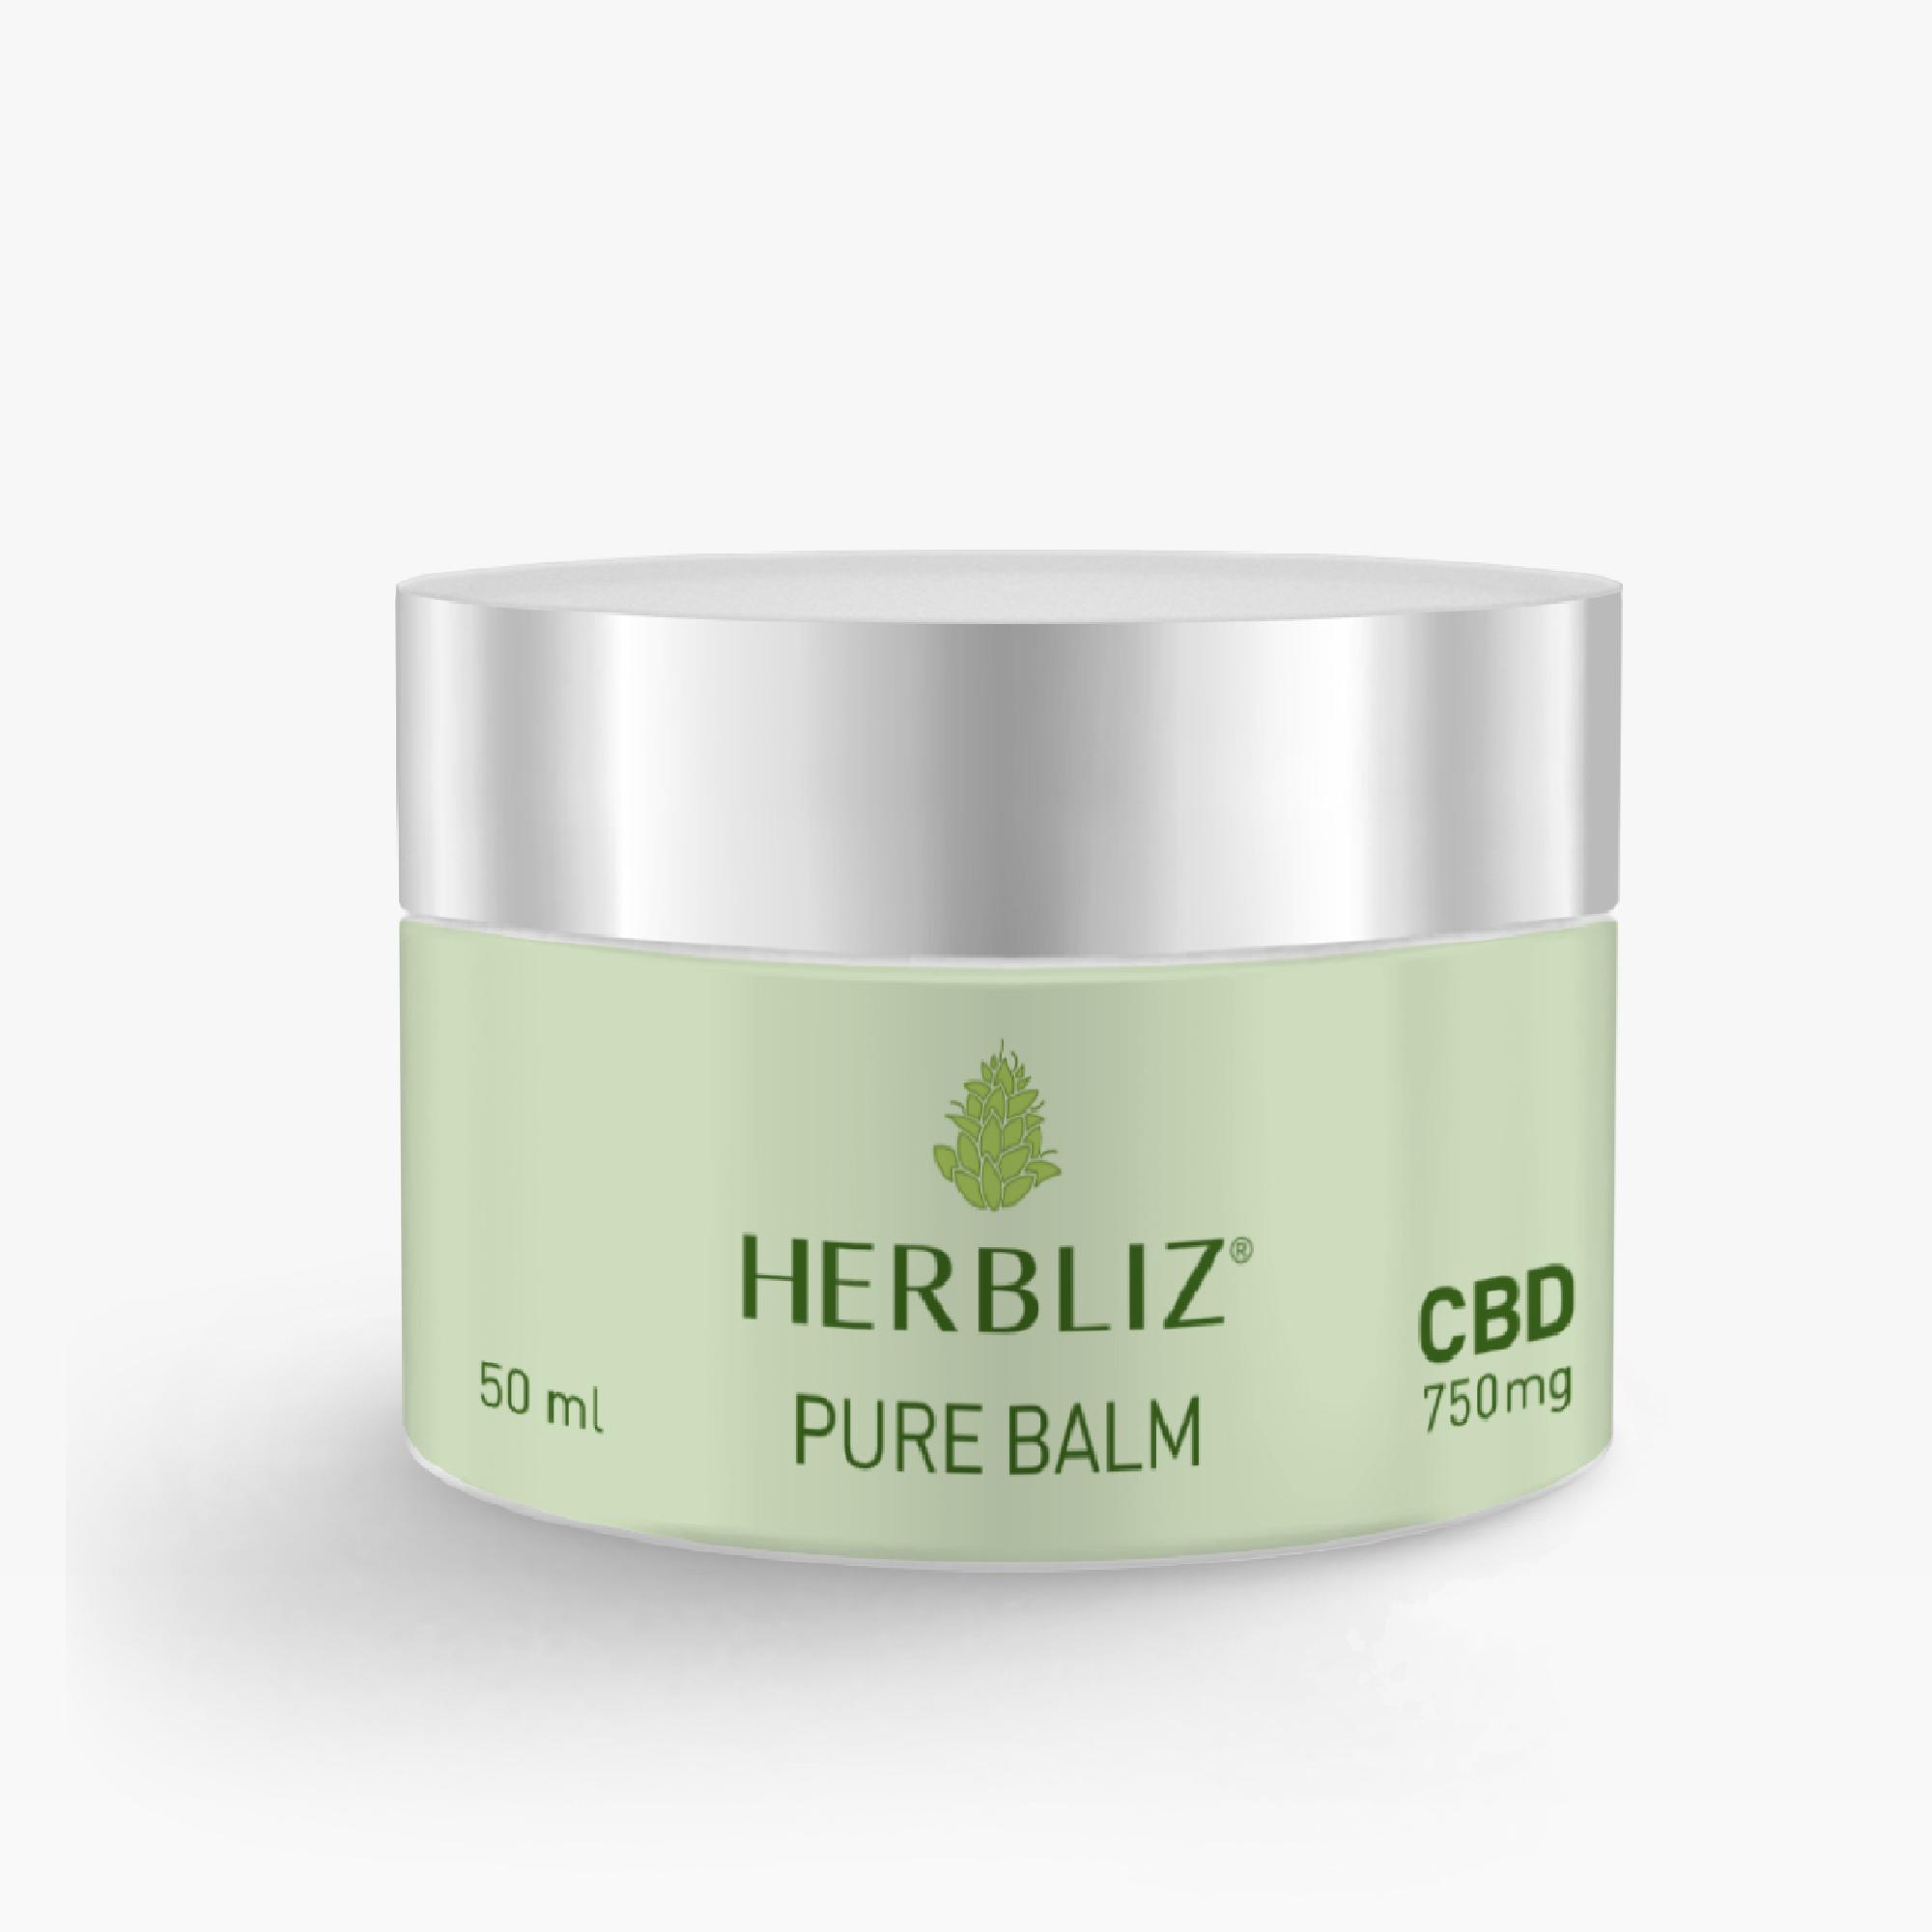 HERBLIZ CBD Pure Balm - 50 ml